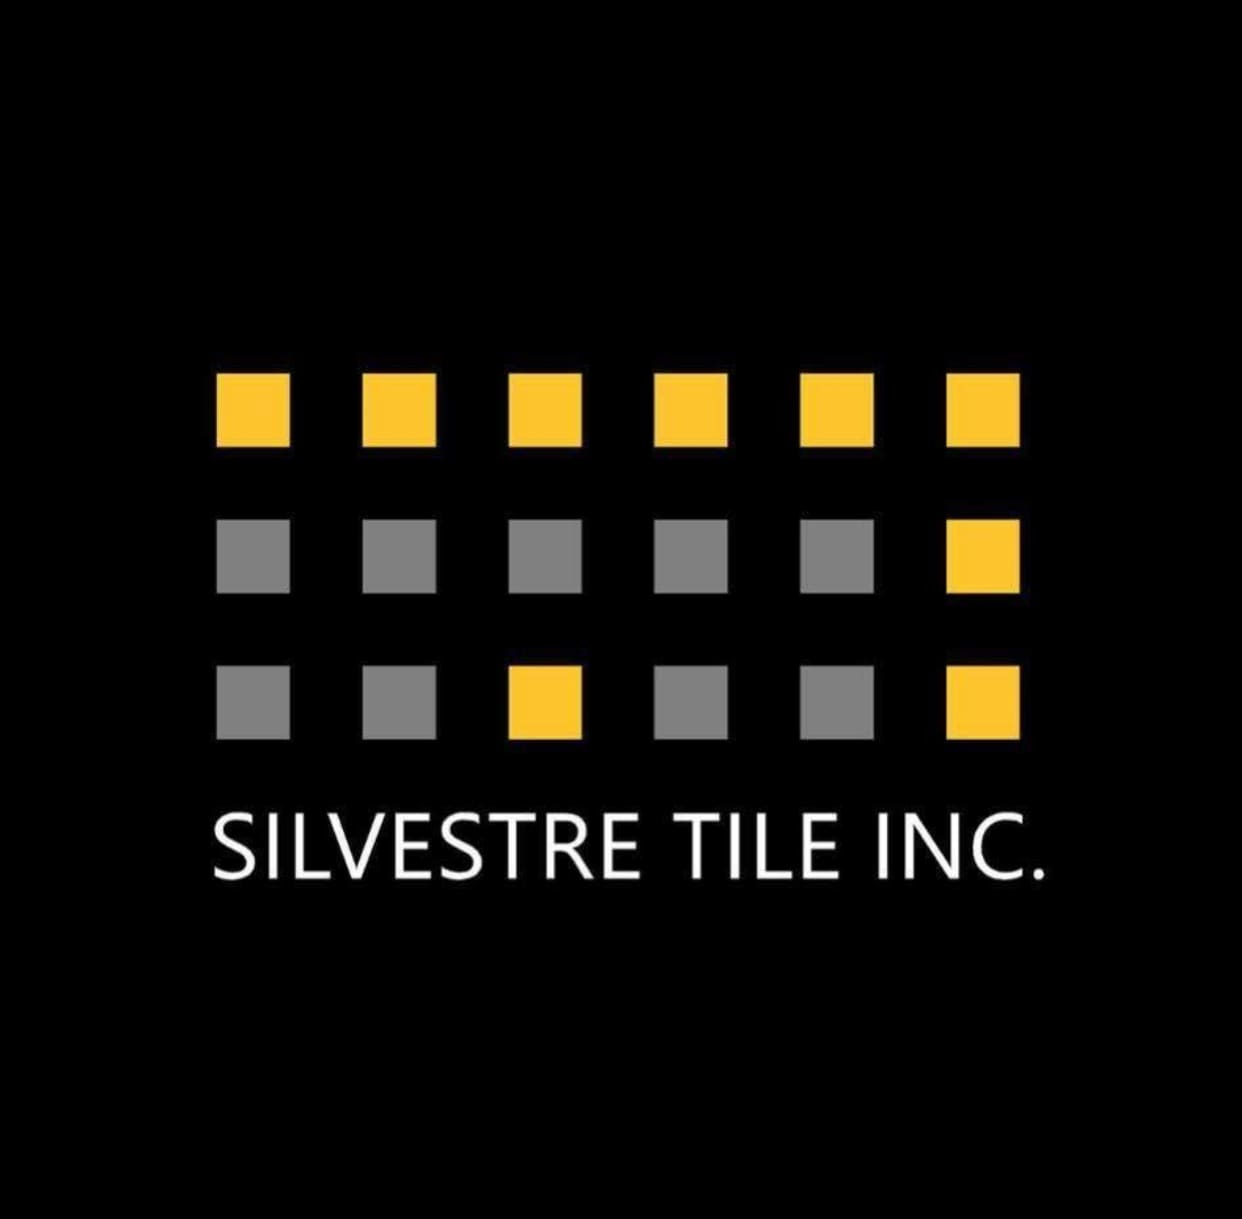 Silvestre Tile, Inc.